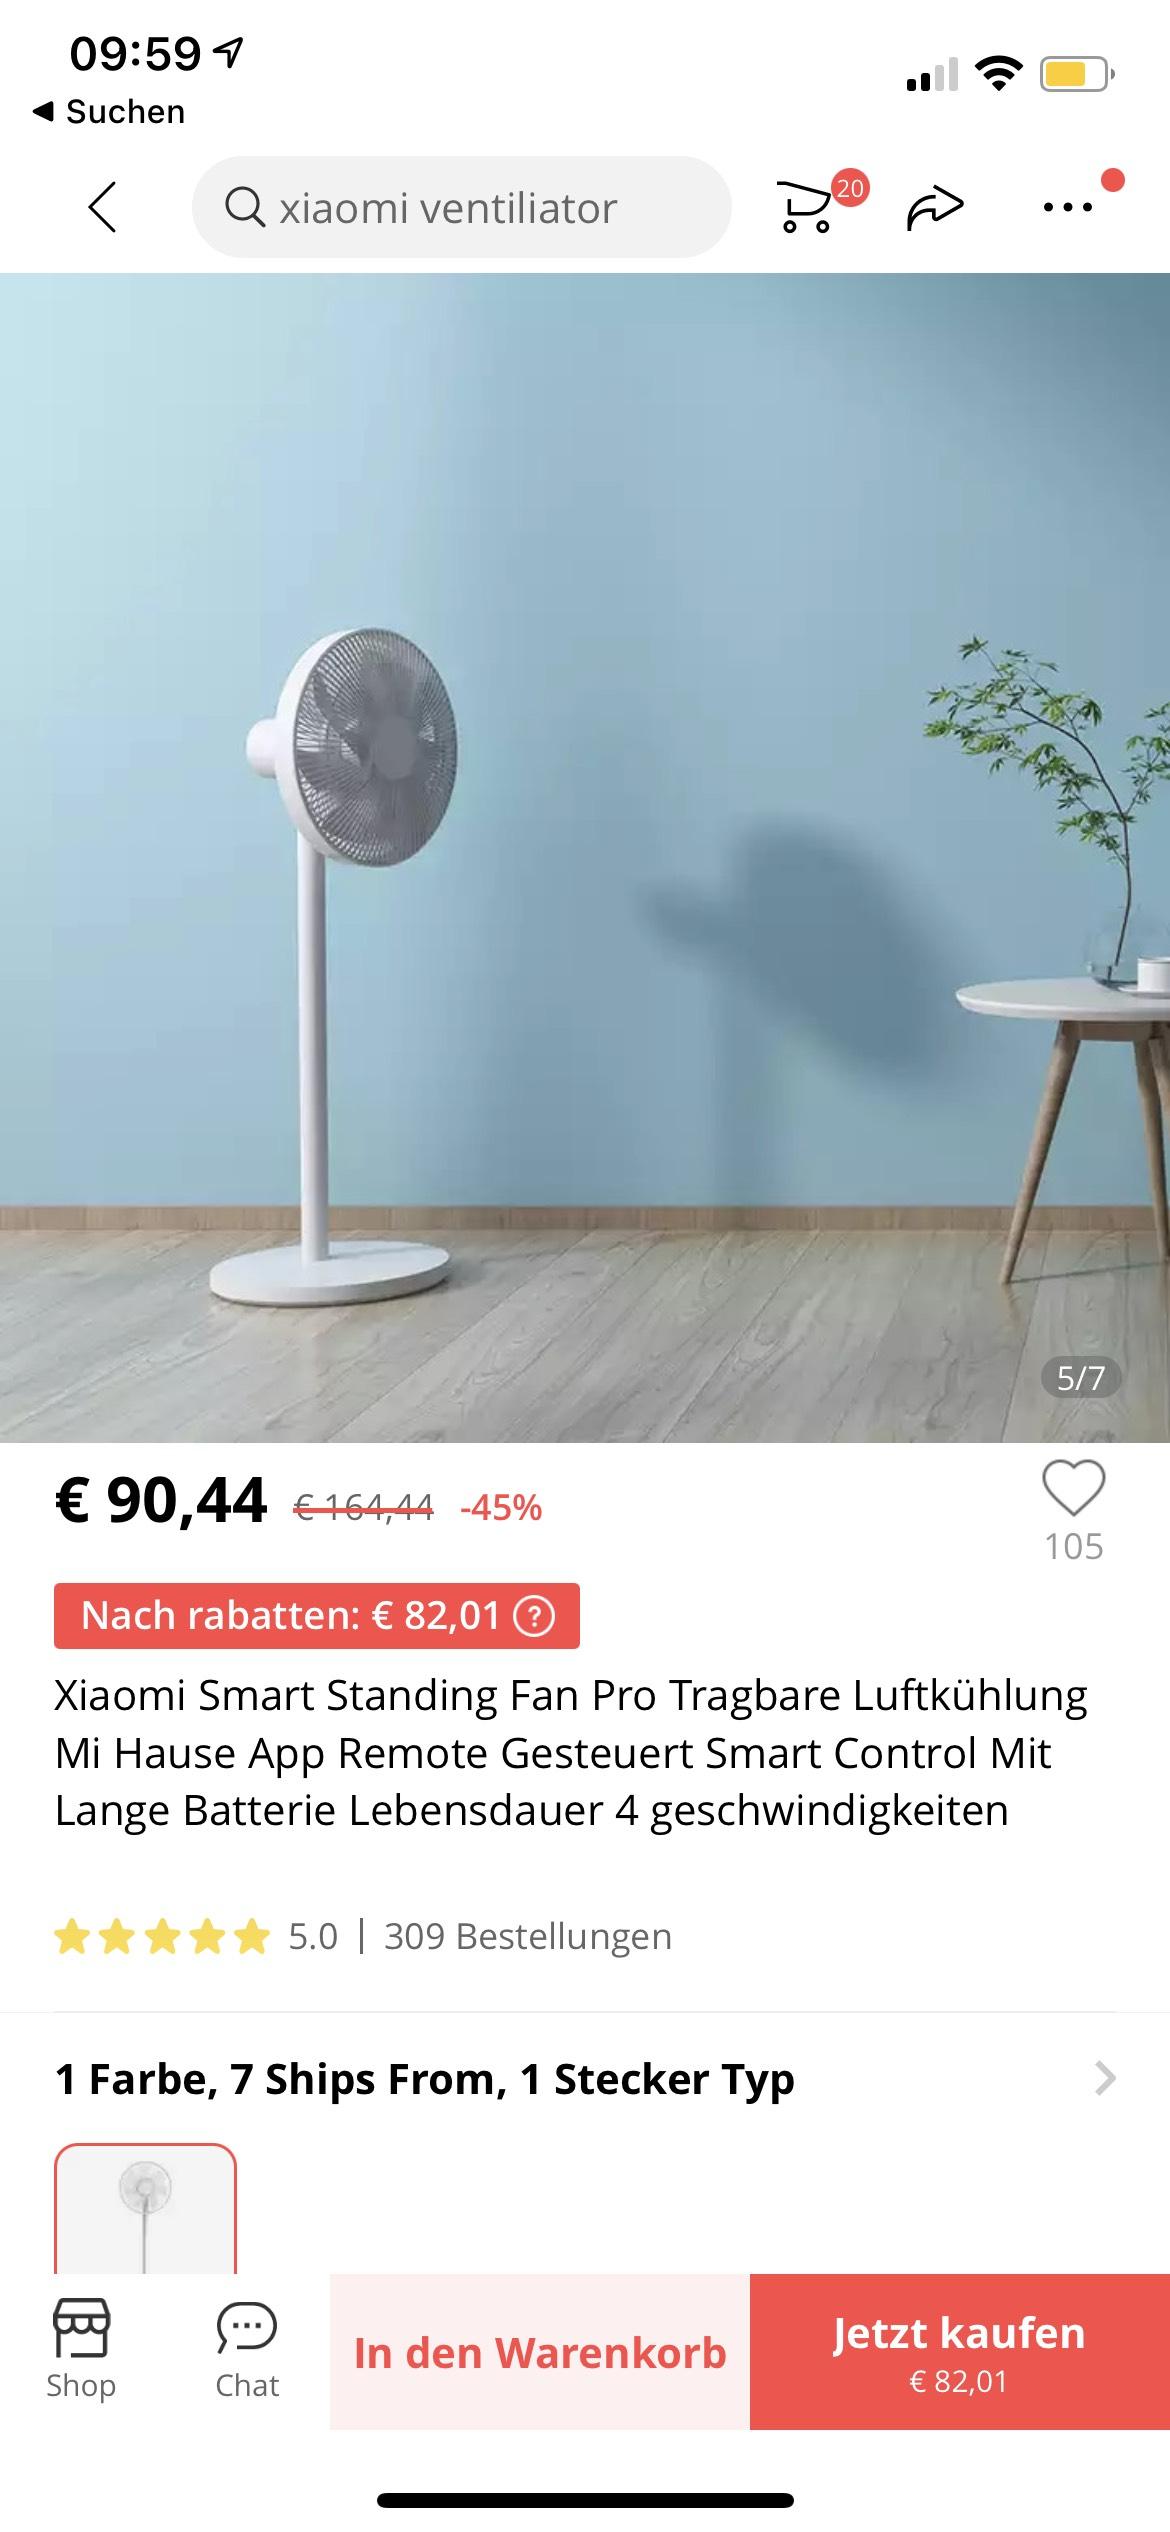 Xiaomi Smart Standing Fan Pro Ventilator Bodenventilator Windmaschine